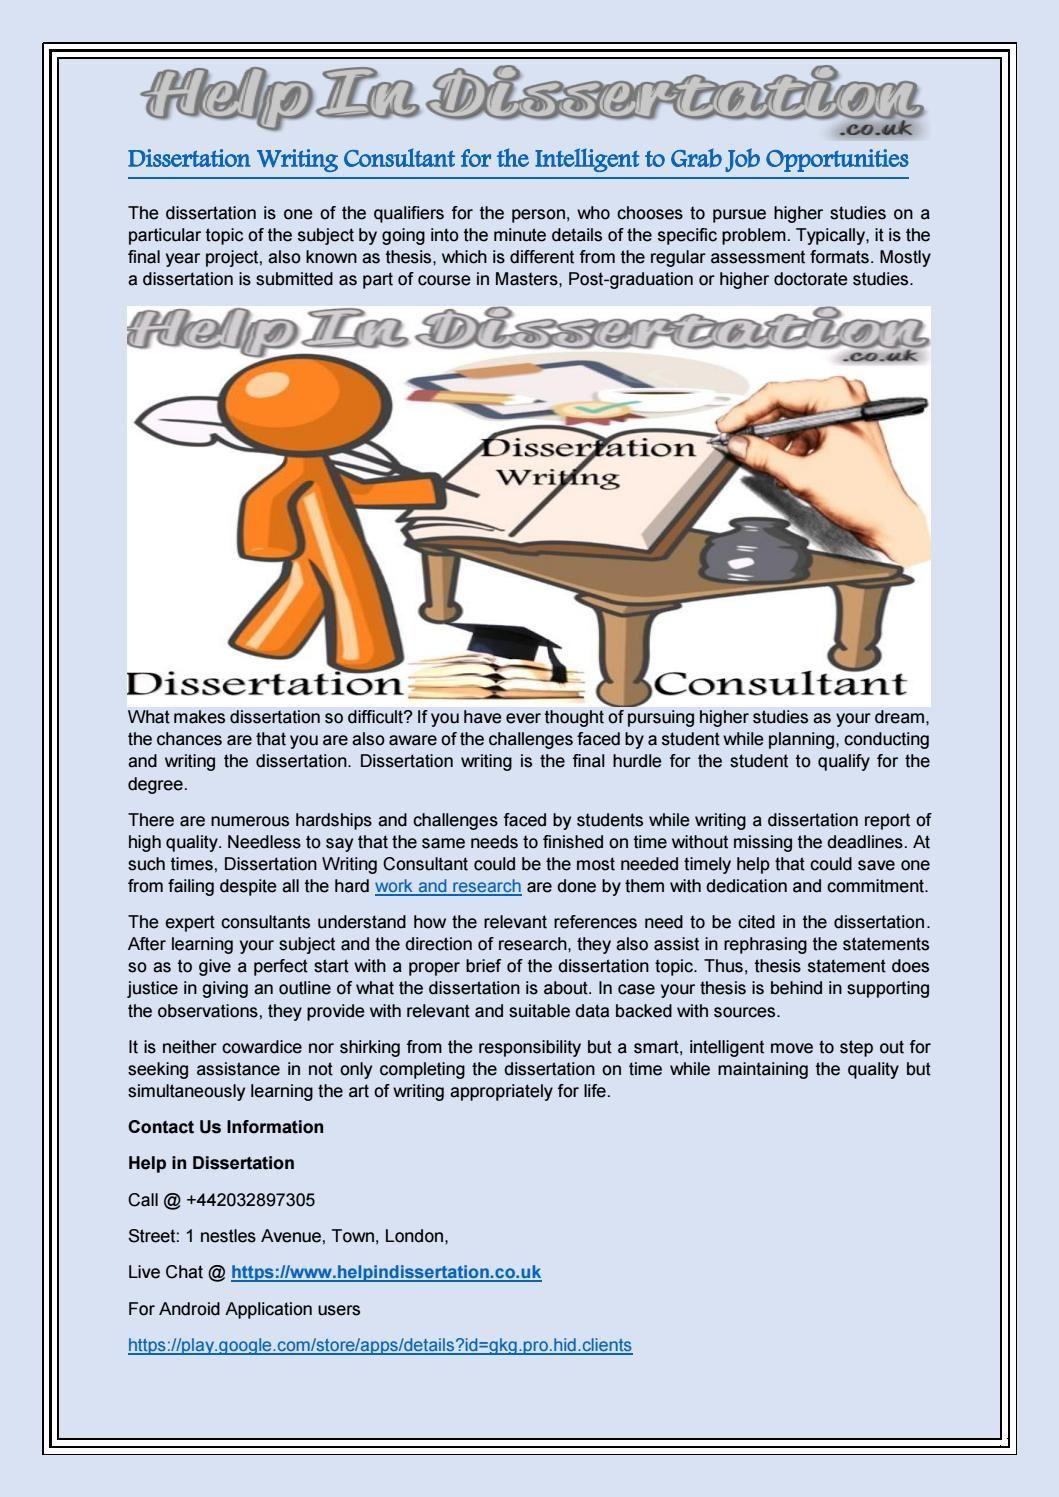 Freelance academic dissertation writing jobs | Home of Dissertations